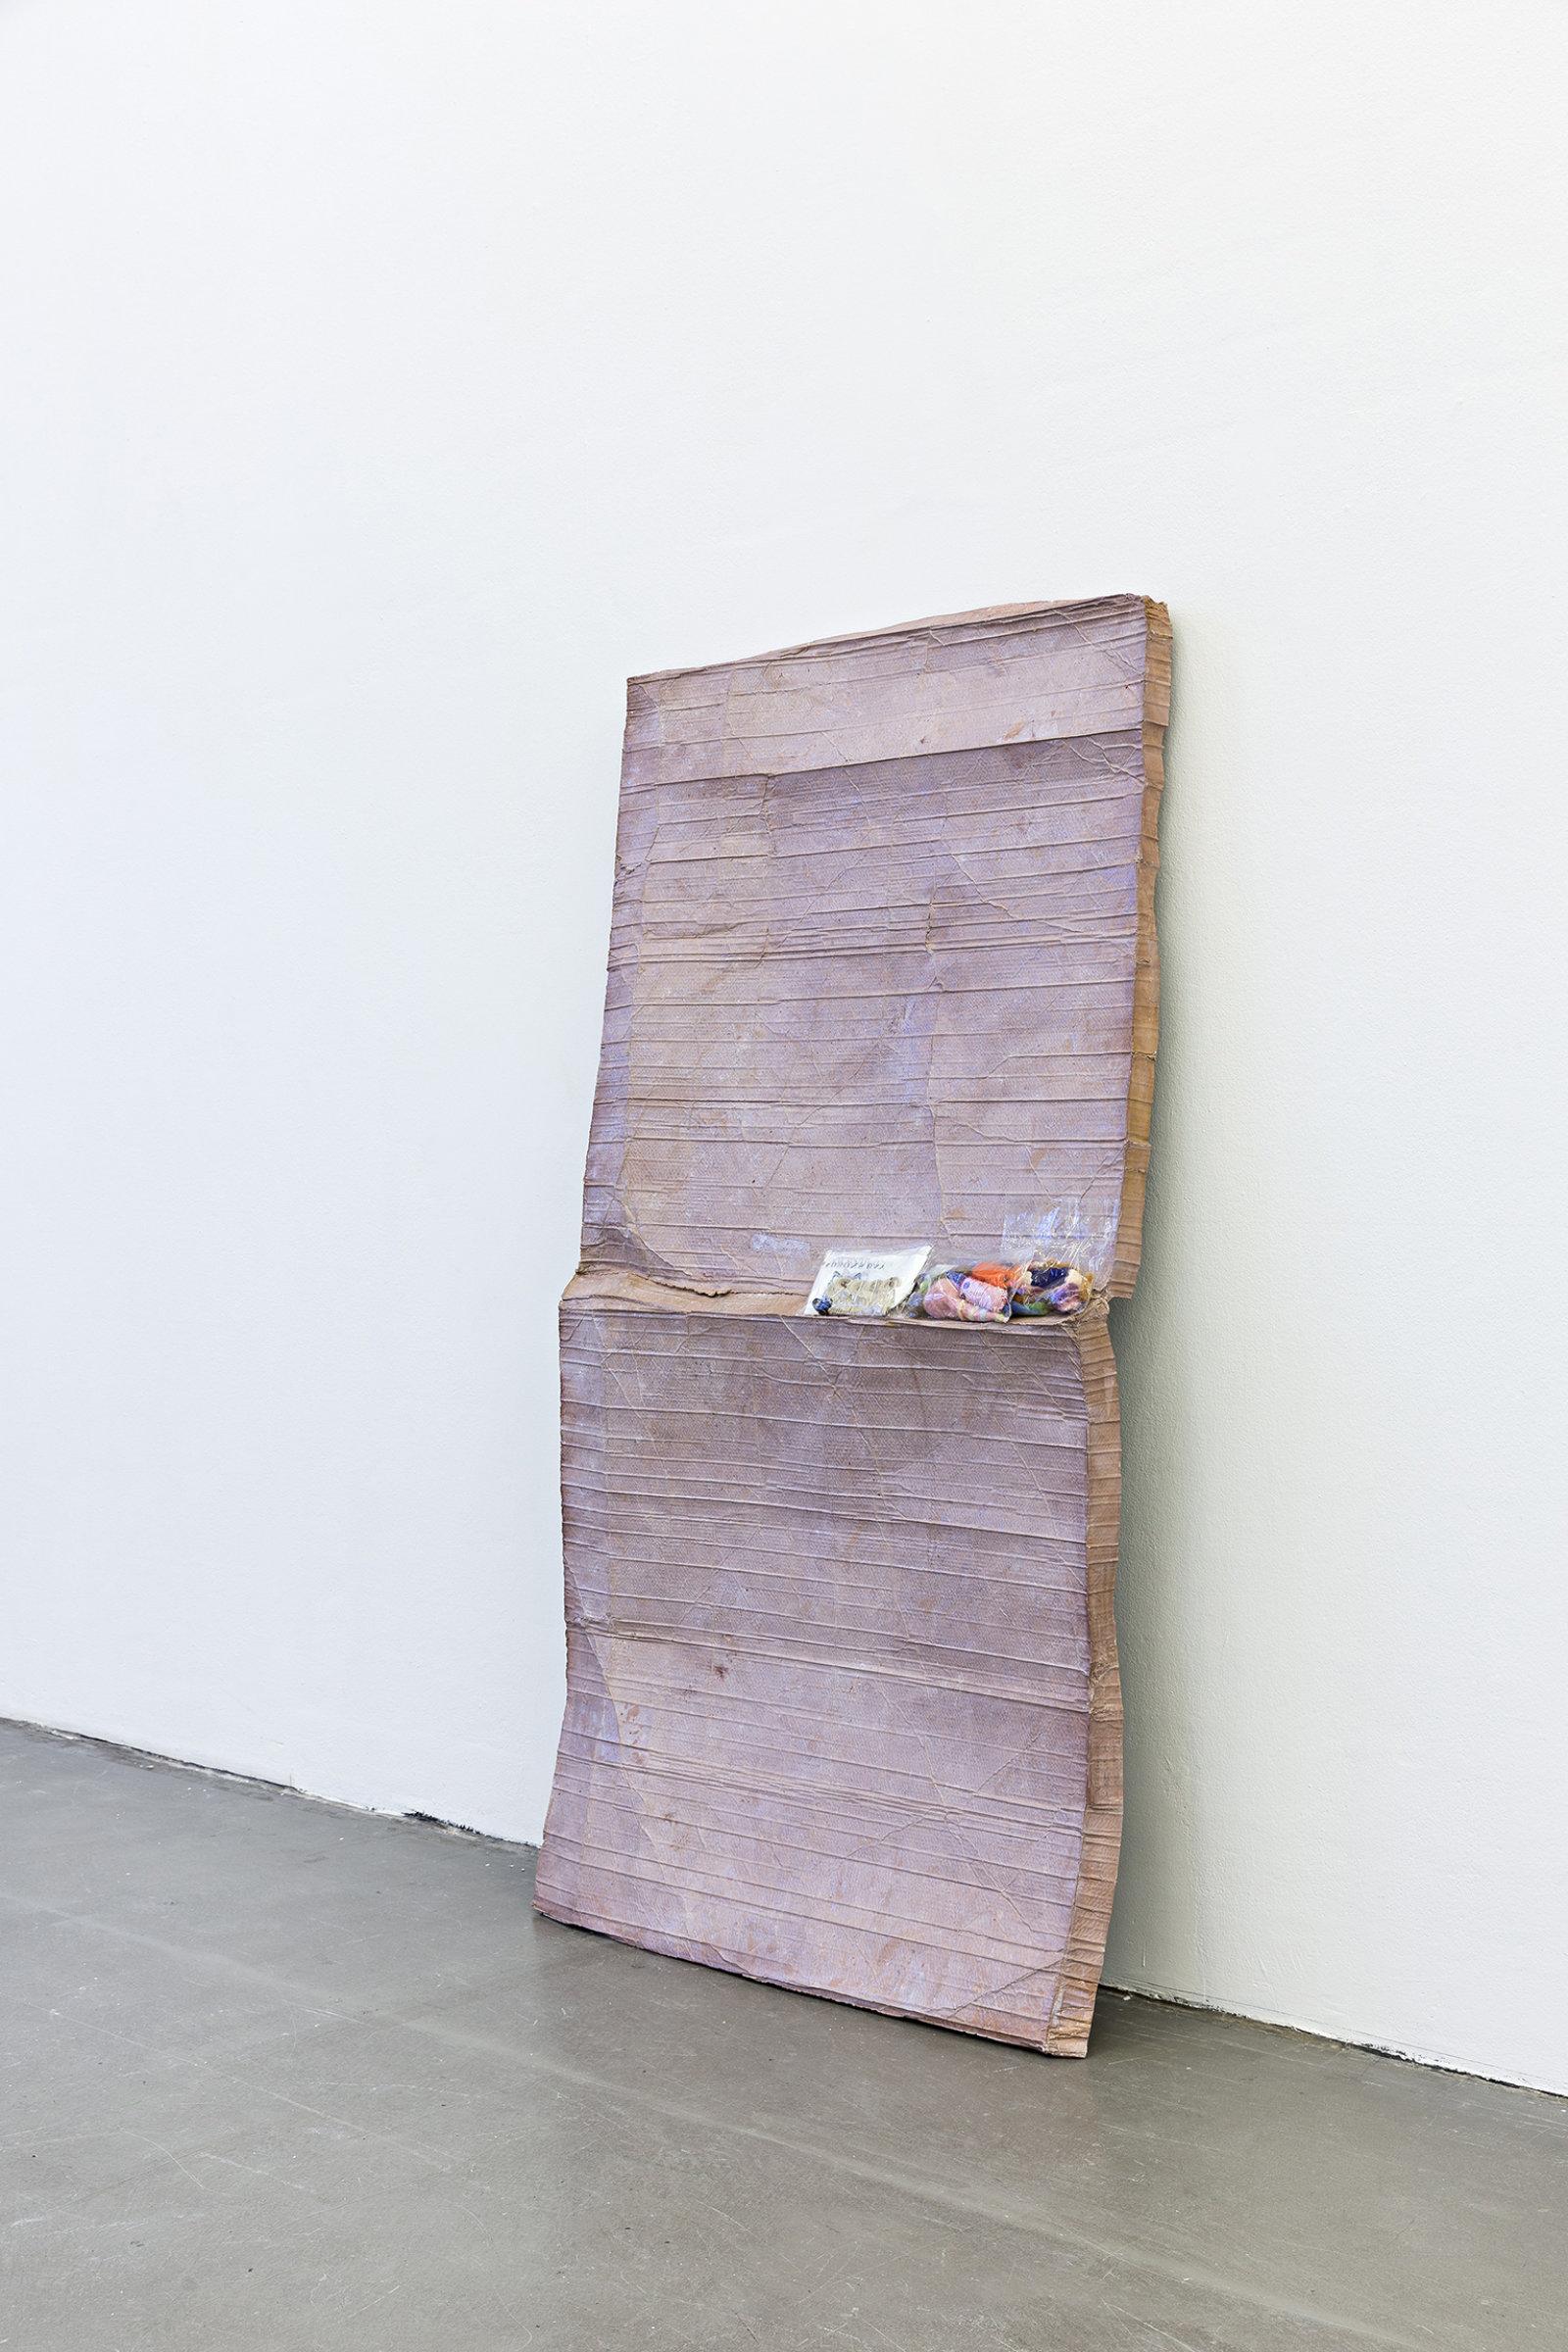 Liz Magor, Felt Family, 2016, polymerized gypsum, wool, hair, plastic, metal, 82 x 43 x 5 in. (208 x 110 x 13 cm) by Liz Magor